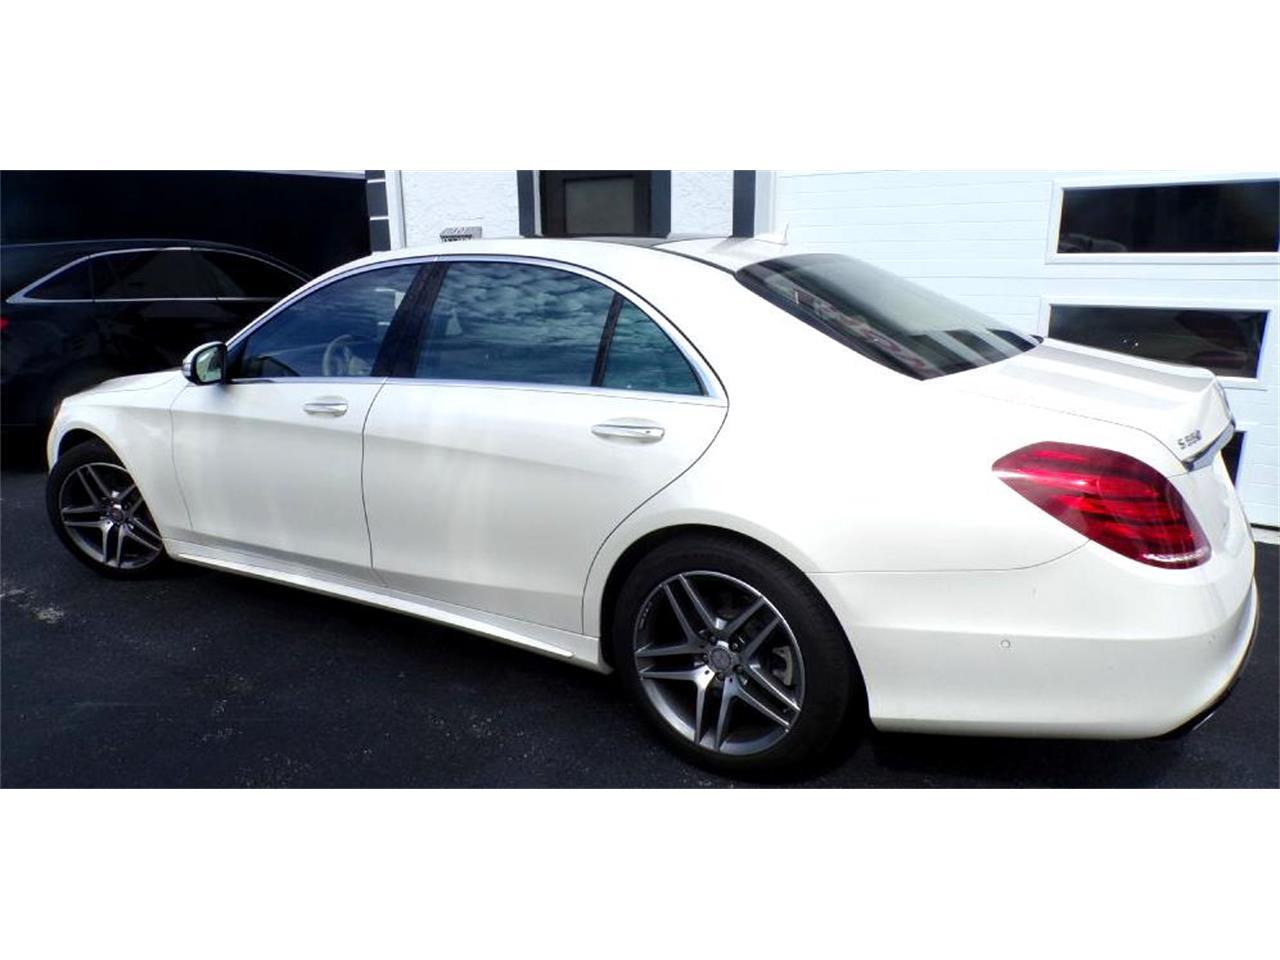 2015 Mercedes-Benz S-Class (CC-1355458) for sale in Boca Raton, Florida